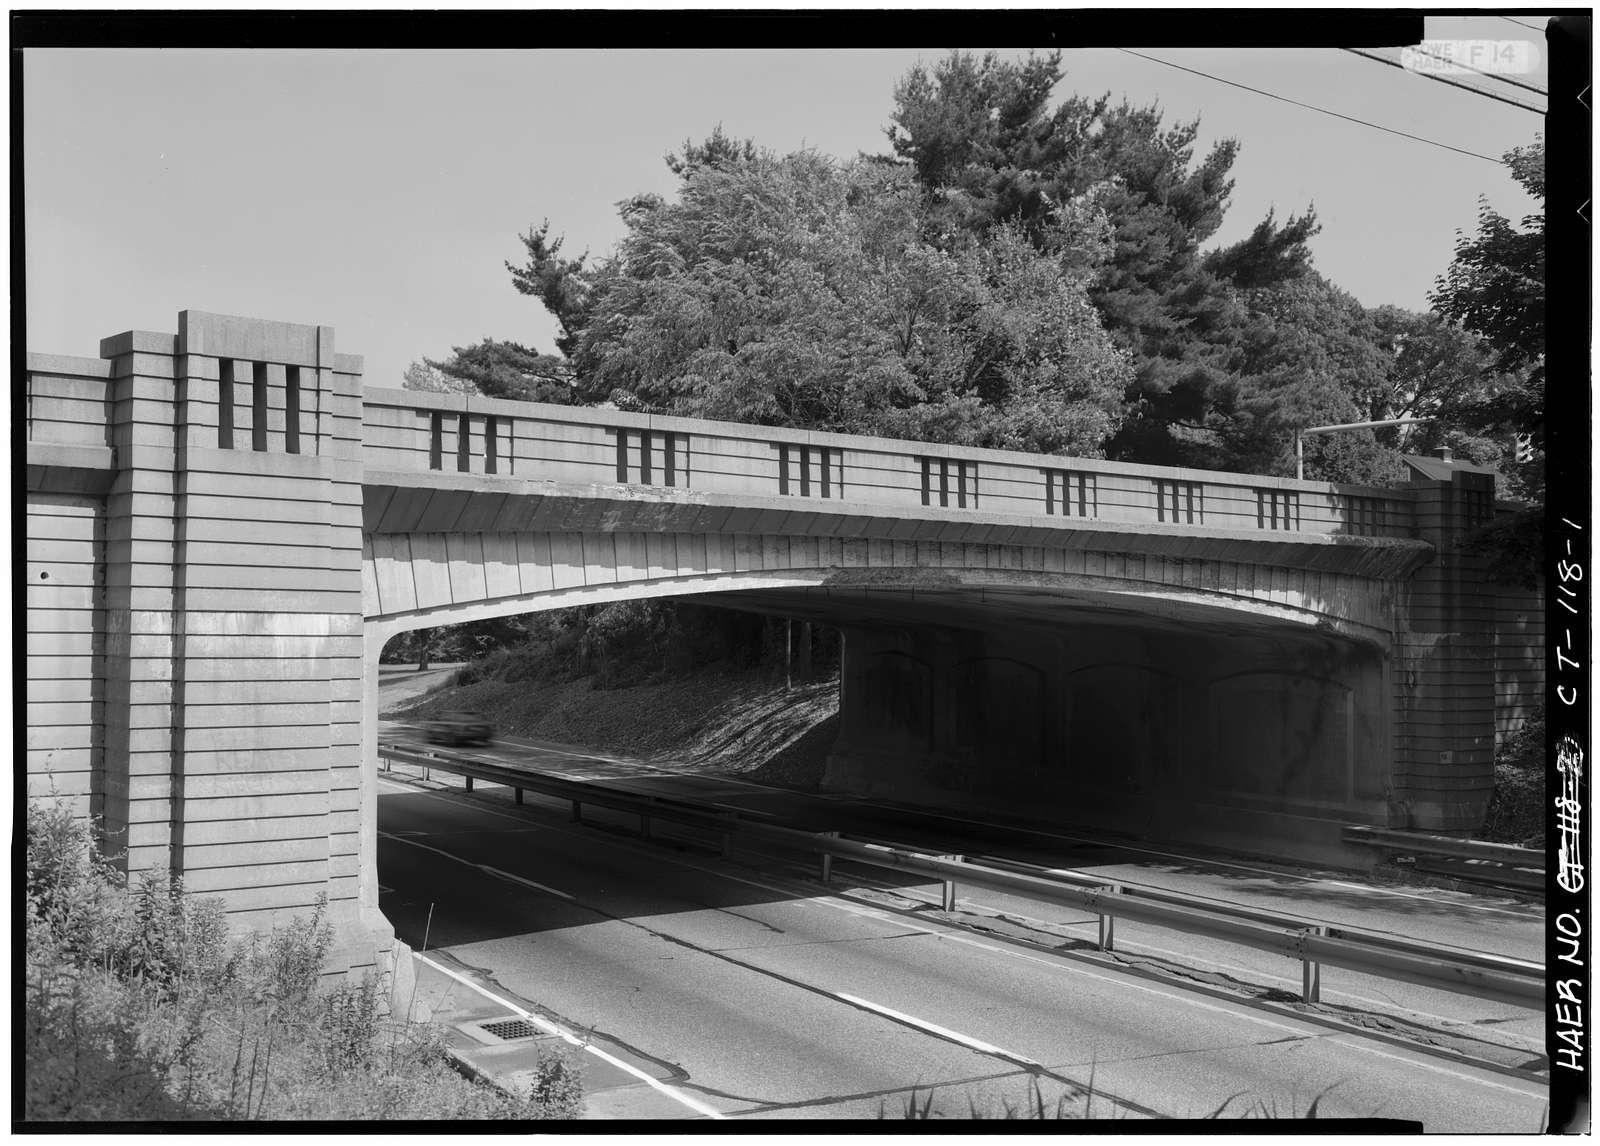 Merritt Parkway, Main Street/Route 25 Bridge, Spanning Merritt Parkway, Trumbull, Fairfield County, CT